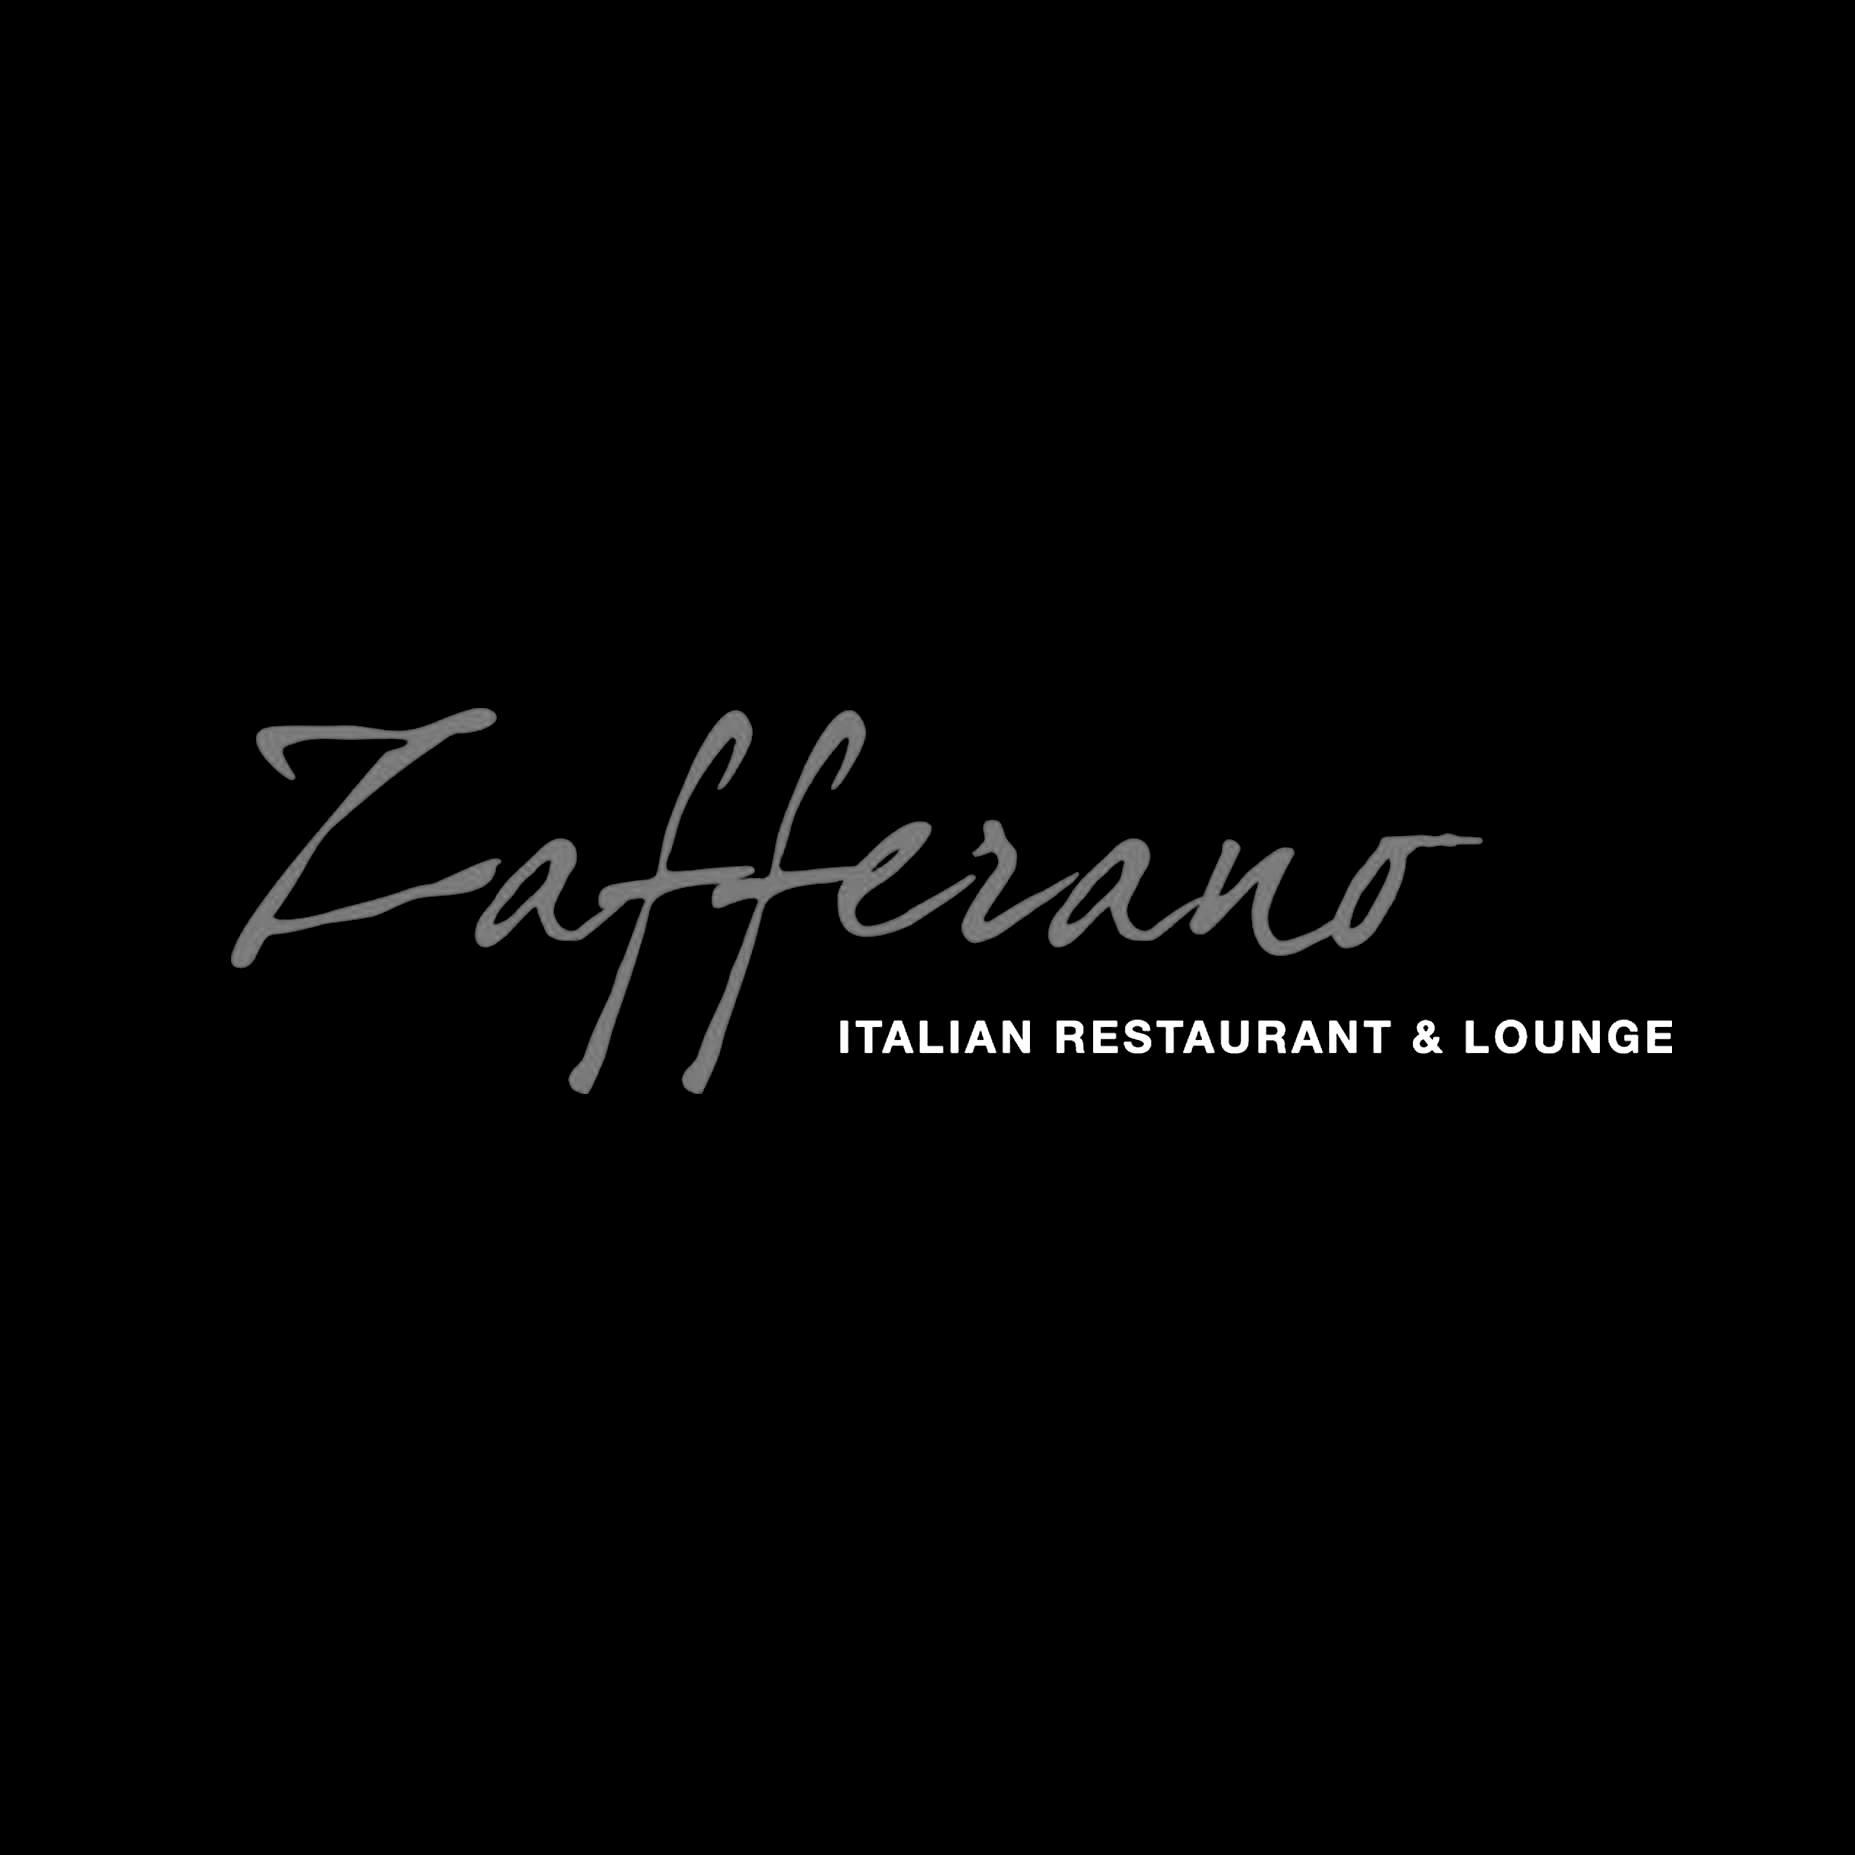 Zafferano_logo_1.jpg